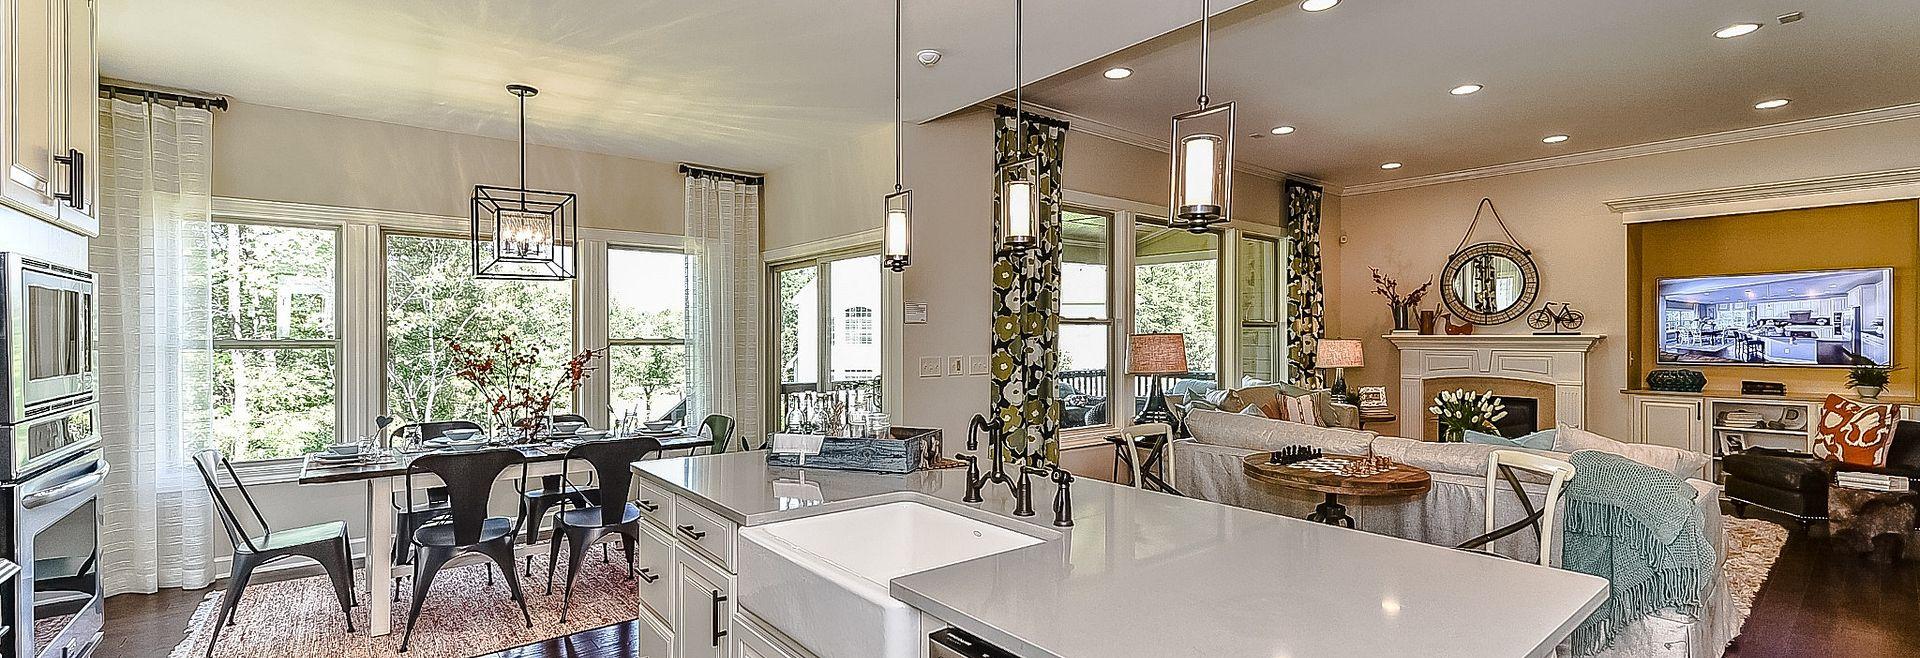 Redwood plan Kitchen, Breakfast, Family Rooms